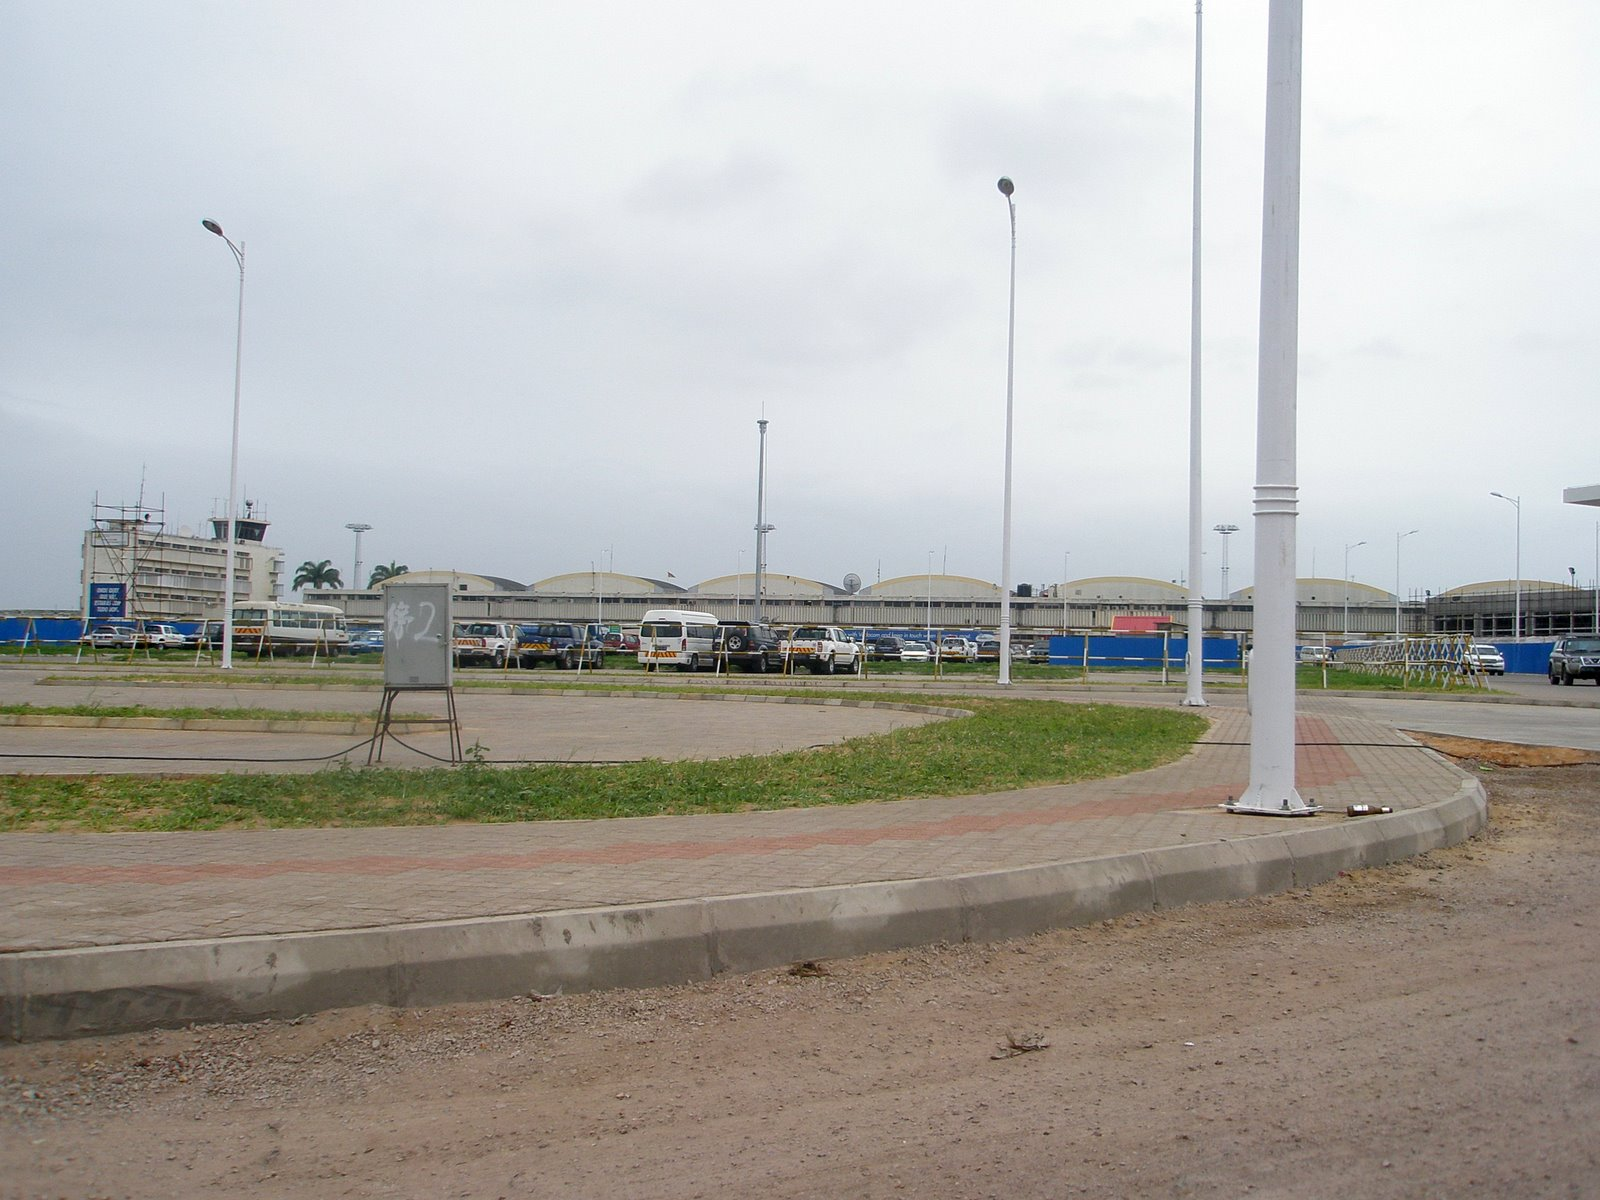 Aeroporto De Quelimane : Digital no Índico imagens de maputo aeroporto